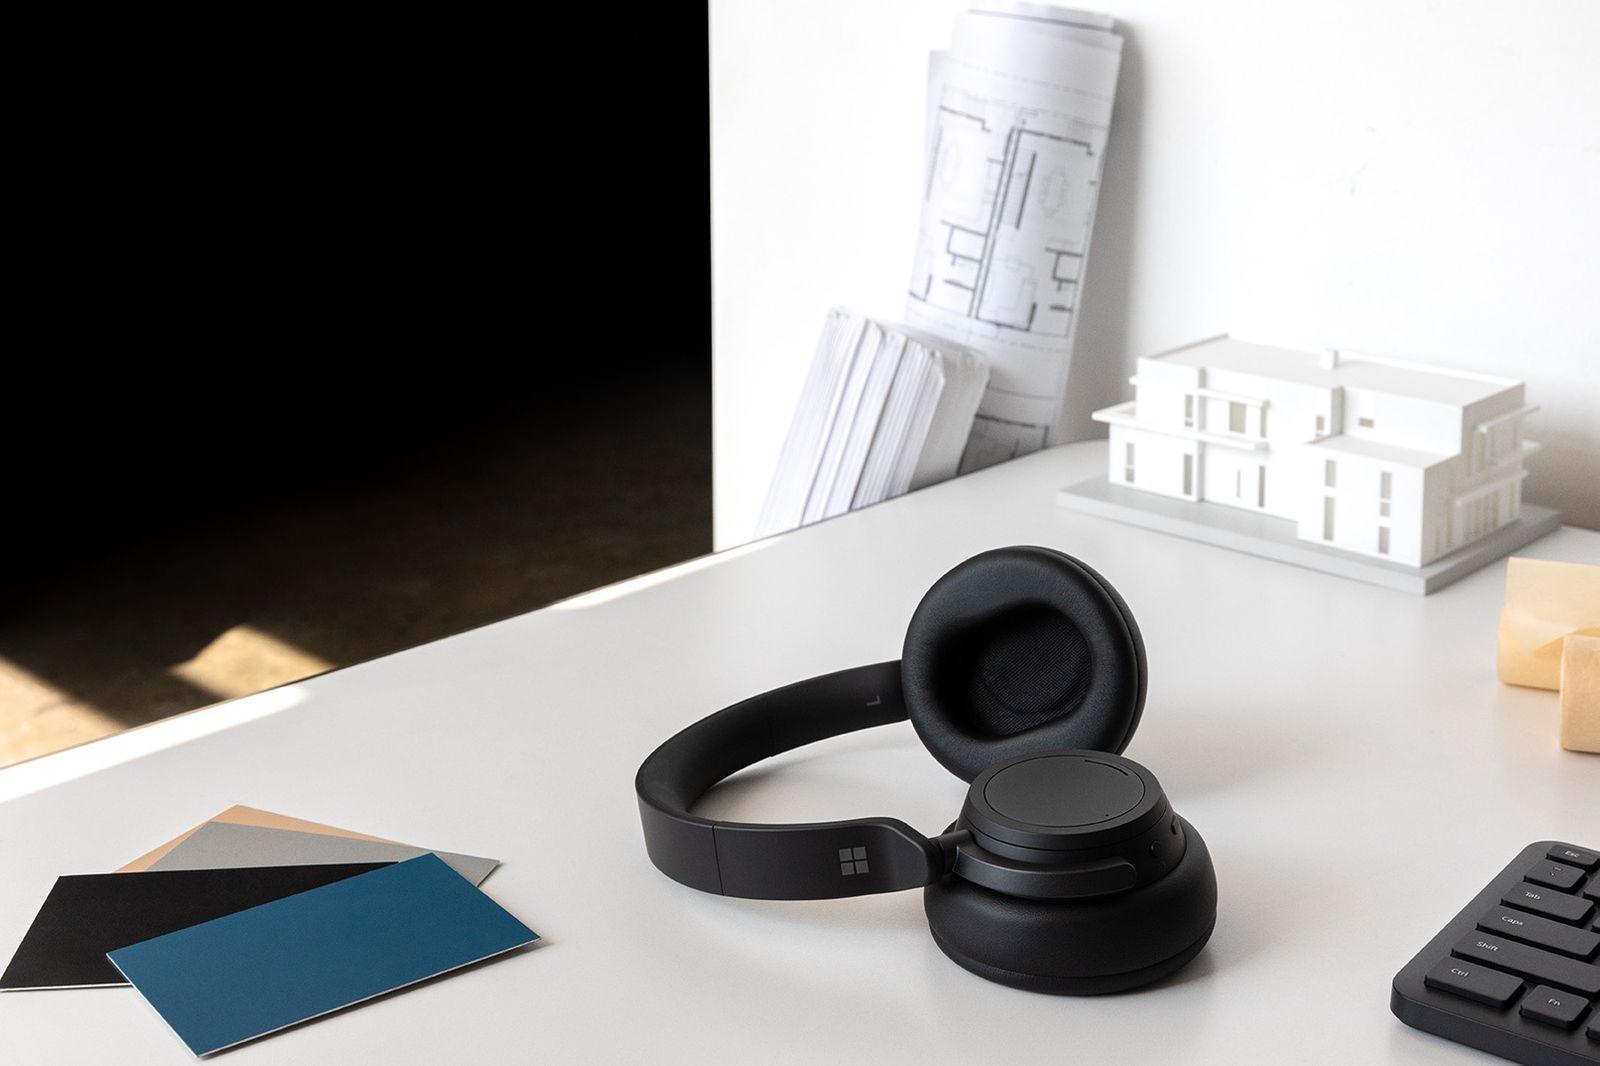 Surface Headphones 2 - Context 2 / SPERRFRIST 6.5. 15 Uhr